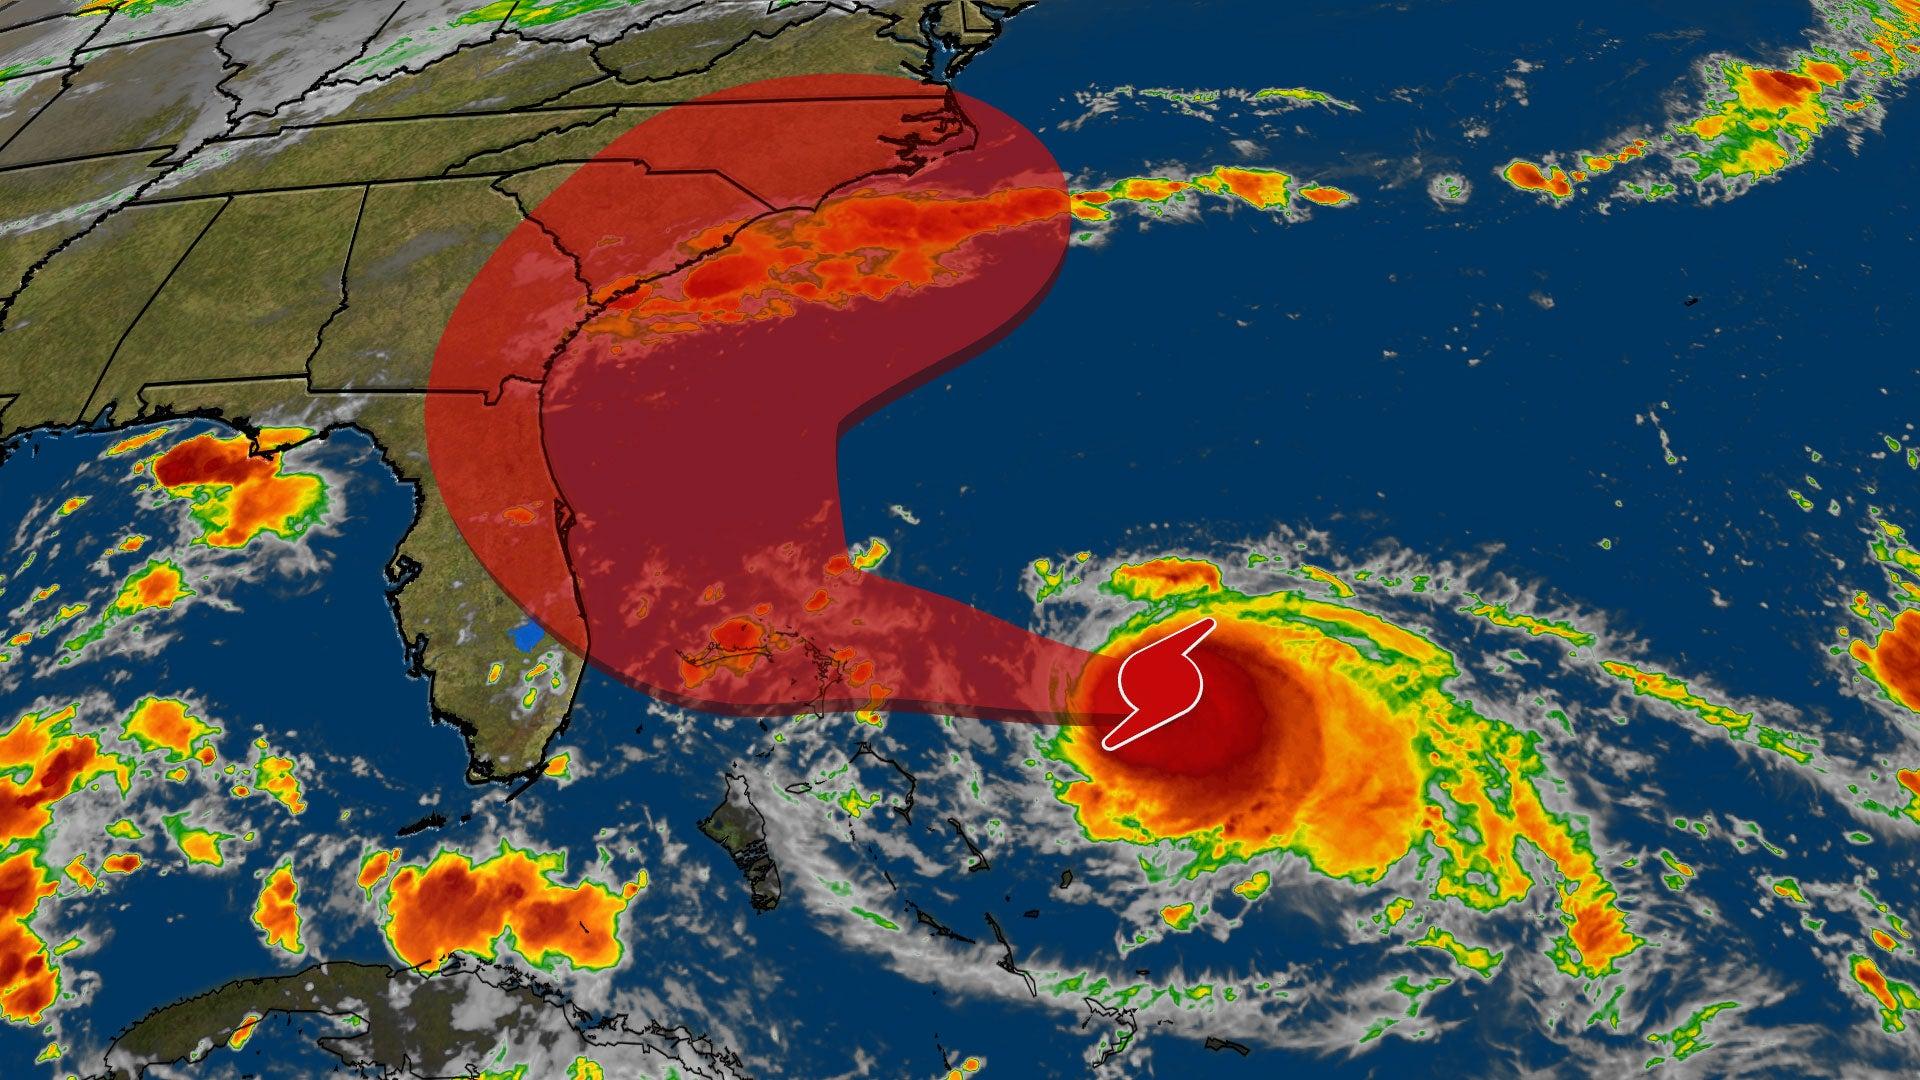 Emergencies Declared in Georgia and Carolinas as Hurricane Dorian's Track Shifts